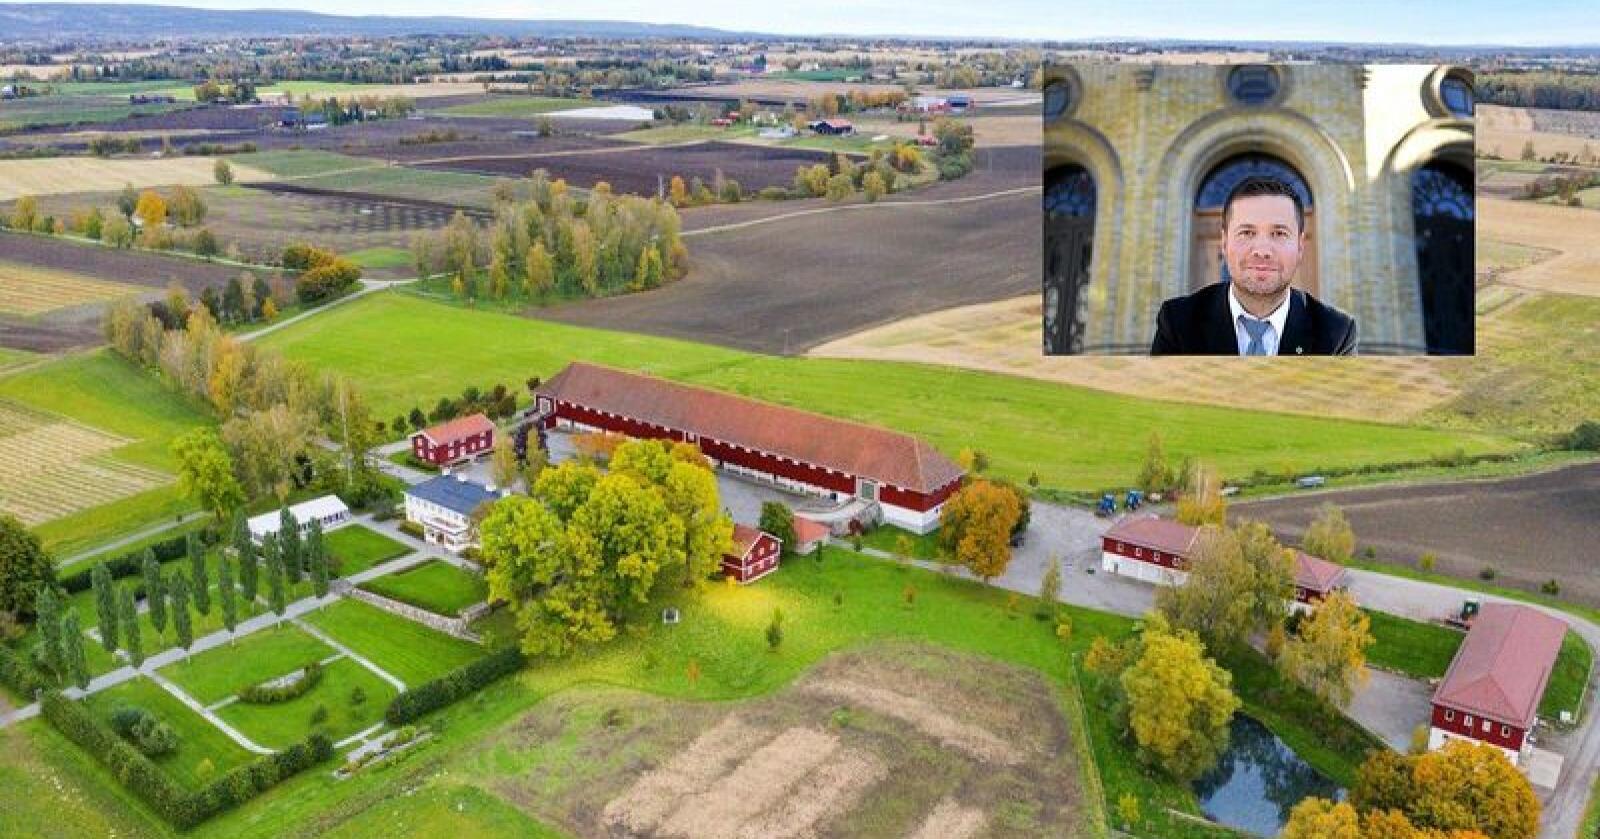 Geir Pollestad er lite fornøyd med at Staur Gård i Stange når blir solgt. Foto: Tegneby & Grønnerød Landbruksmegling/Siri Juell Rasmussen